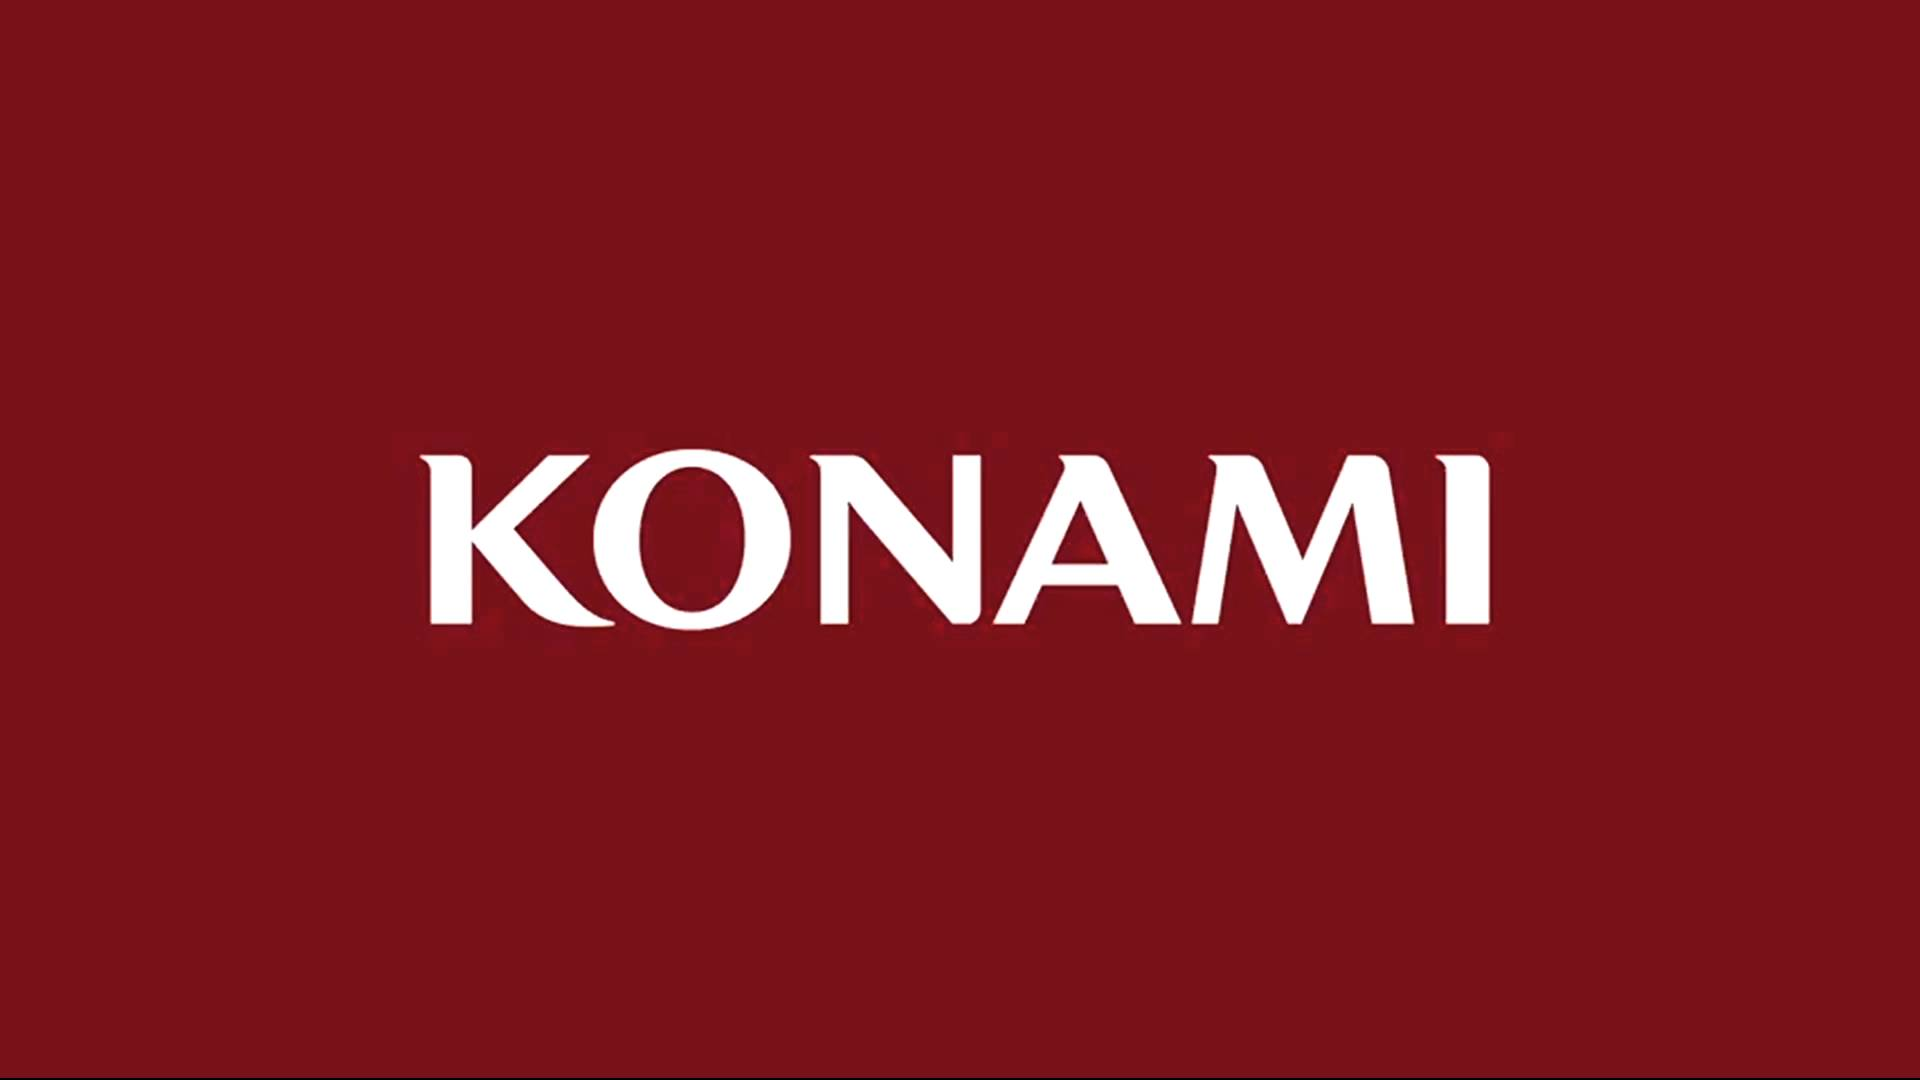 konami_large_header